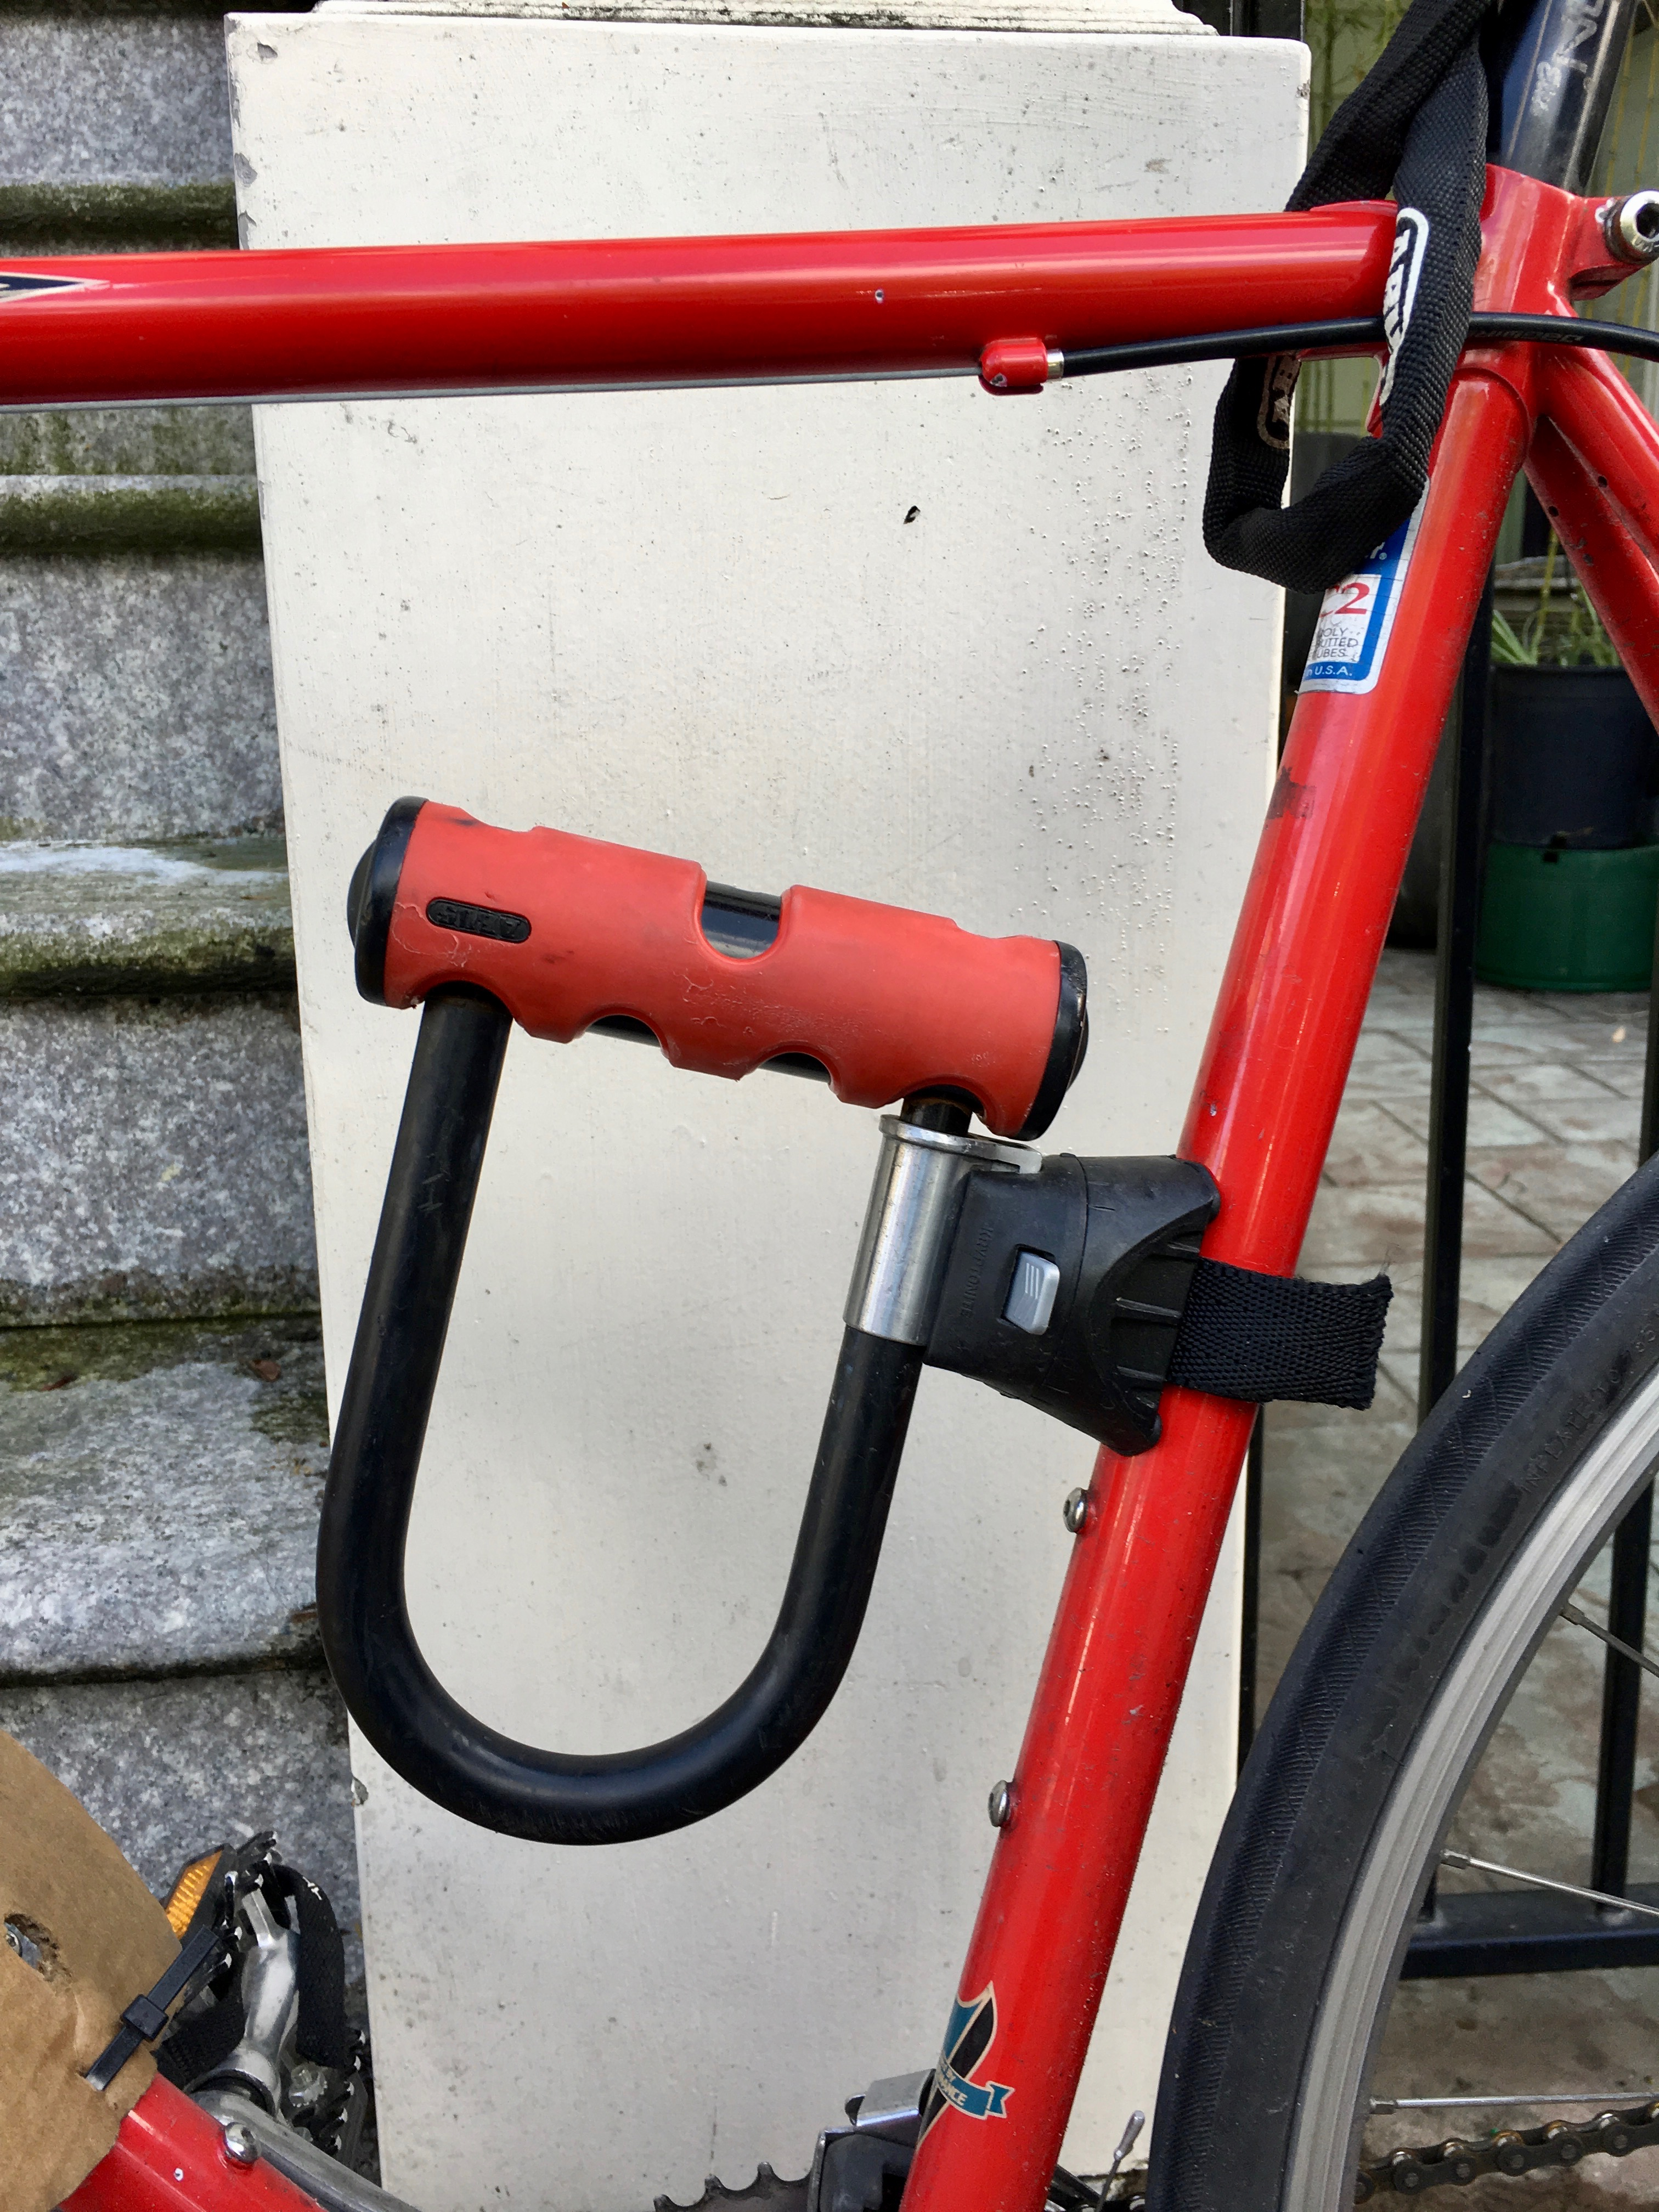 Kryptonite Transit Handlebar U Lock Kit Mount Bracket For Bike Bars Cycle Locks